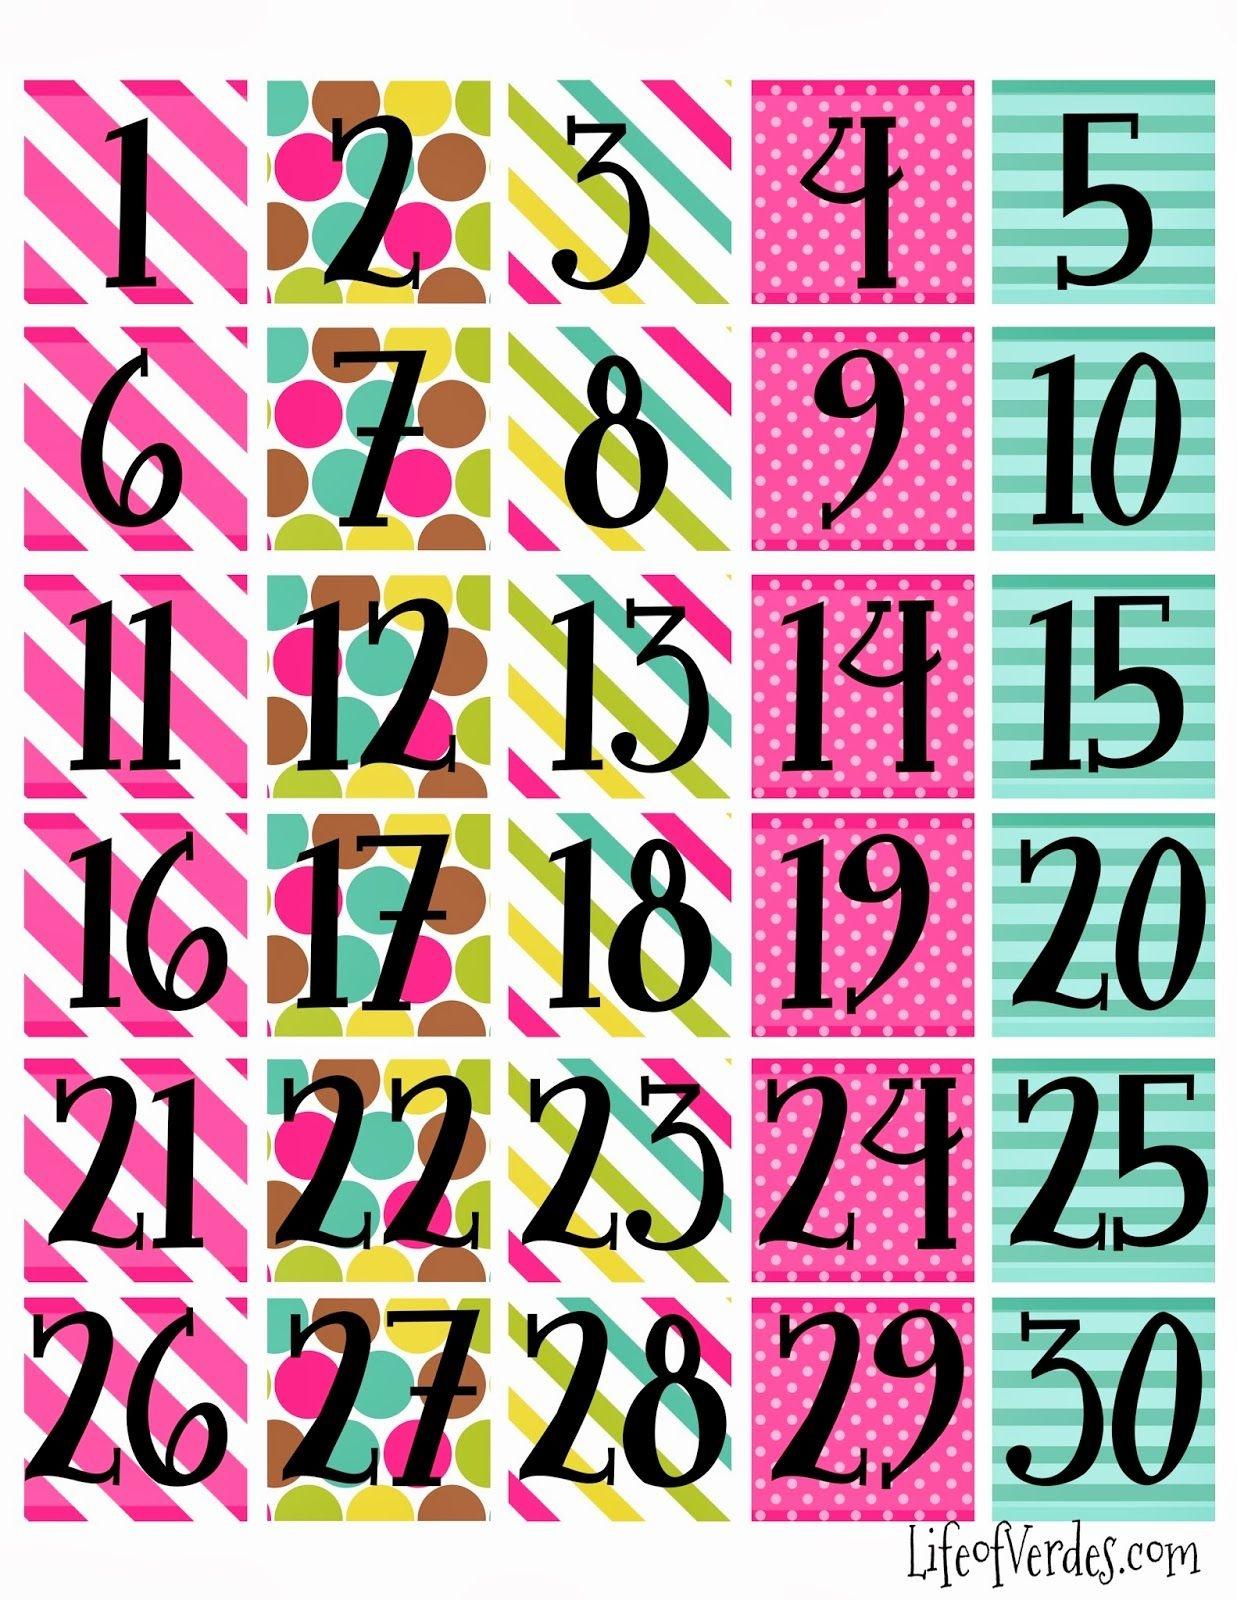 Freeprintablecalendarnumbers Household Info Pinterest3abry